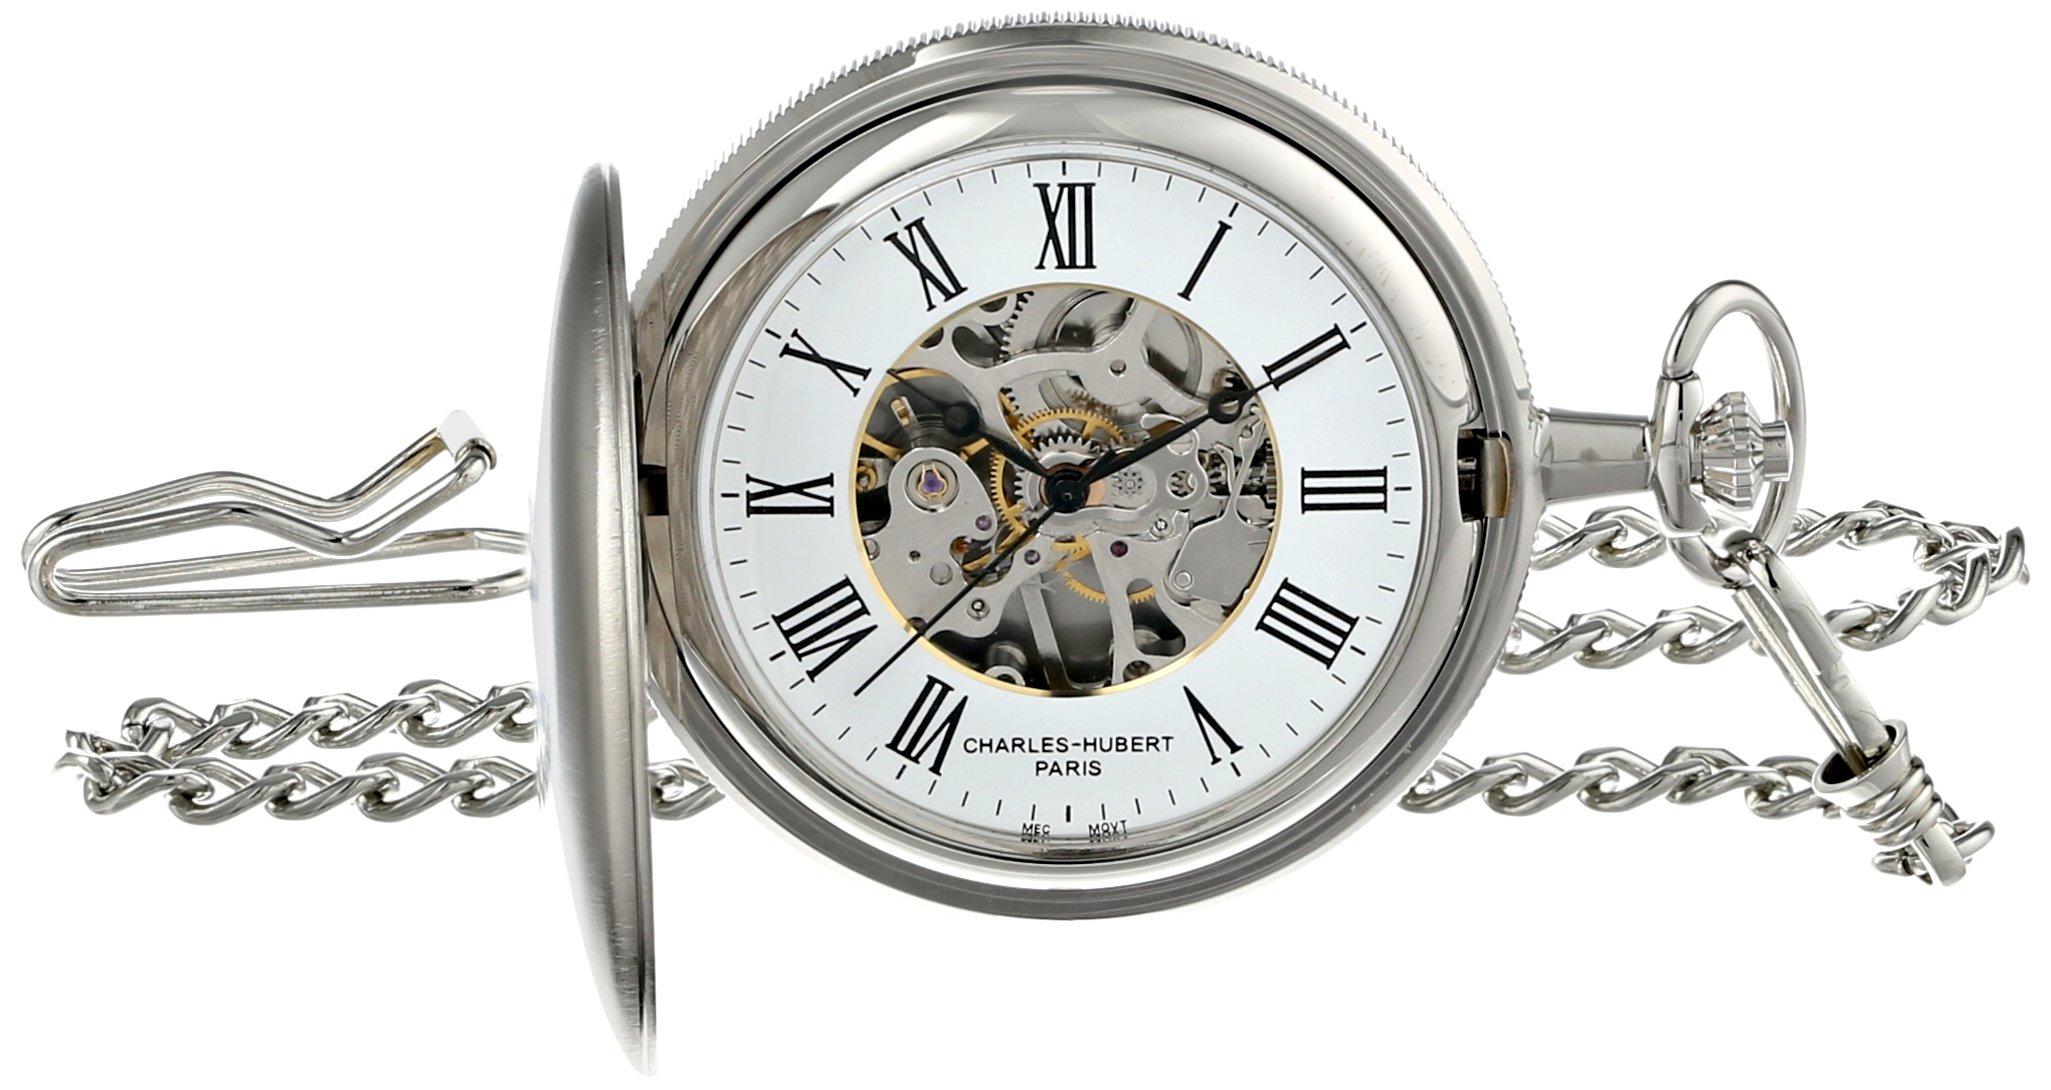 Charles-Hubert, Paris Satin Finish Mechanical Pocket Watch by CHARLES-HUBERT PARIS